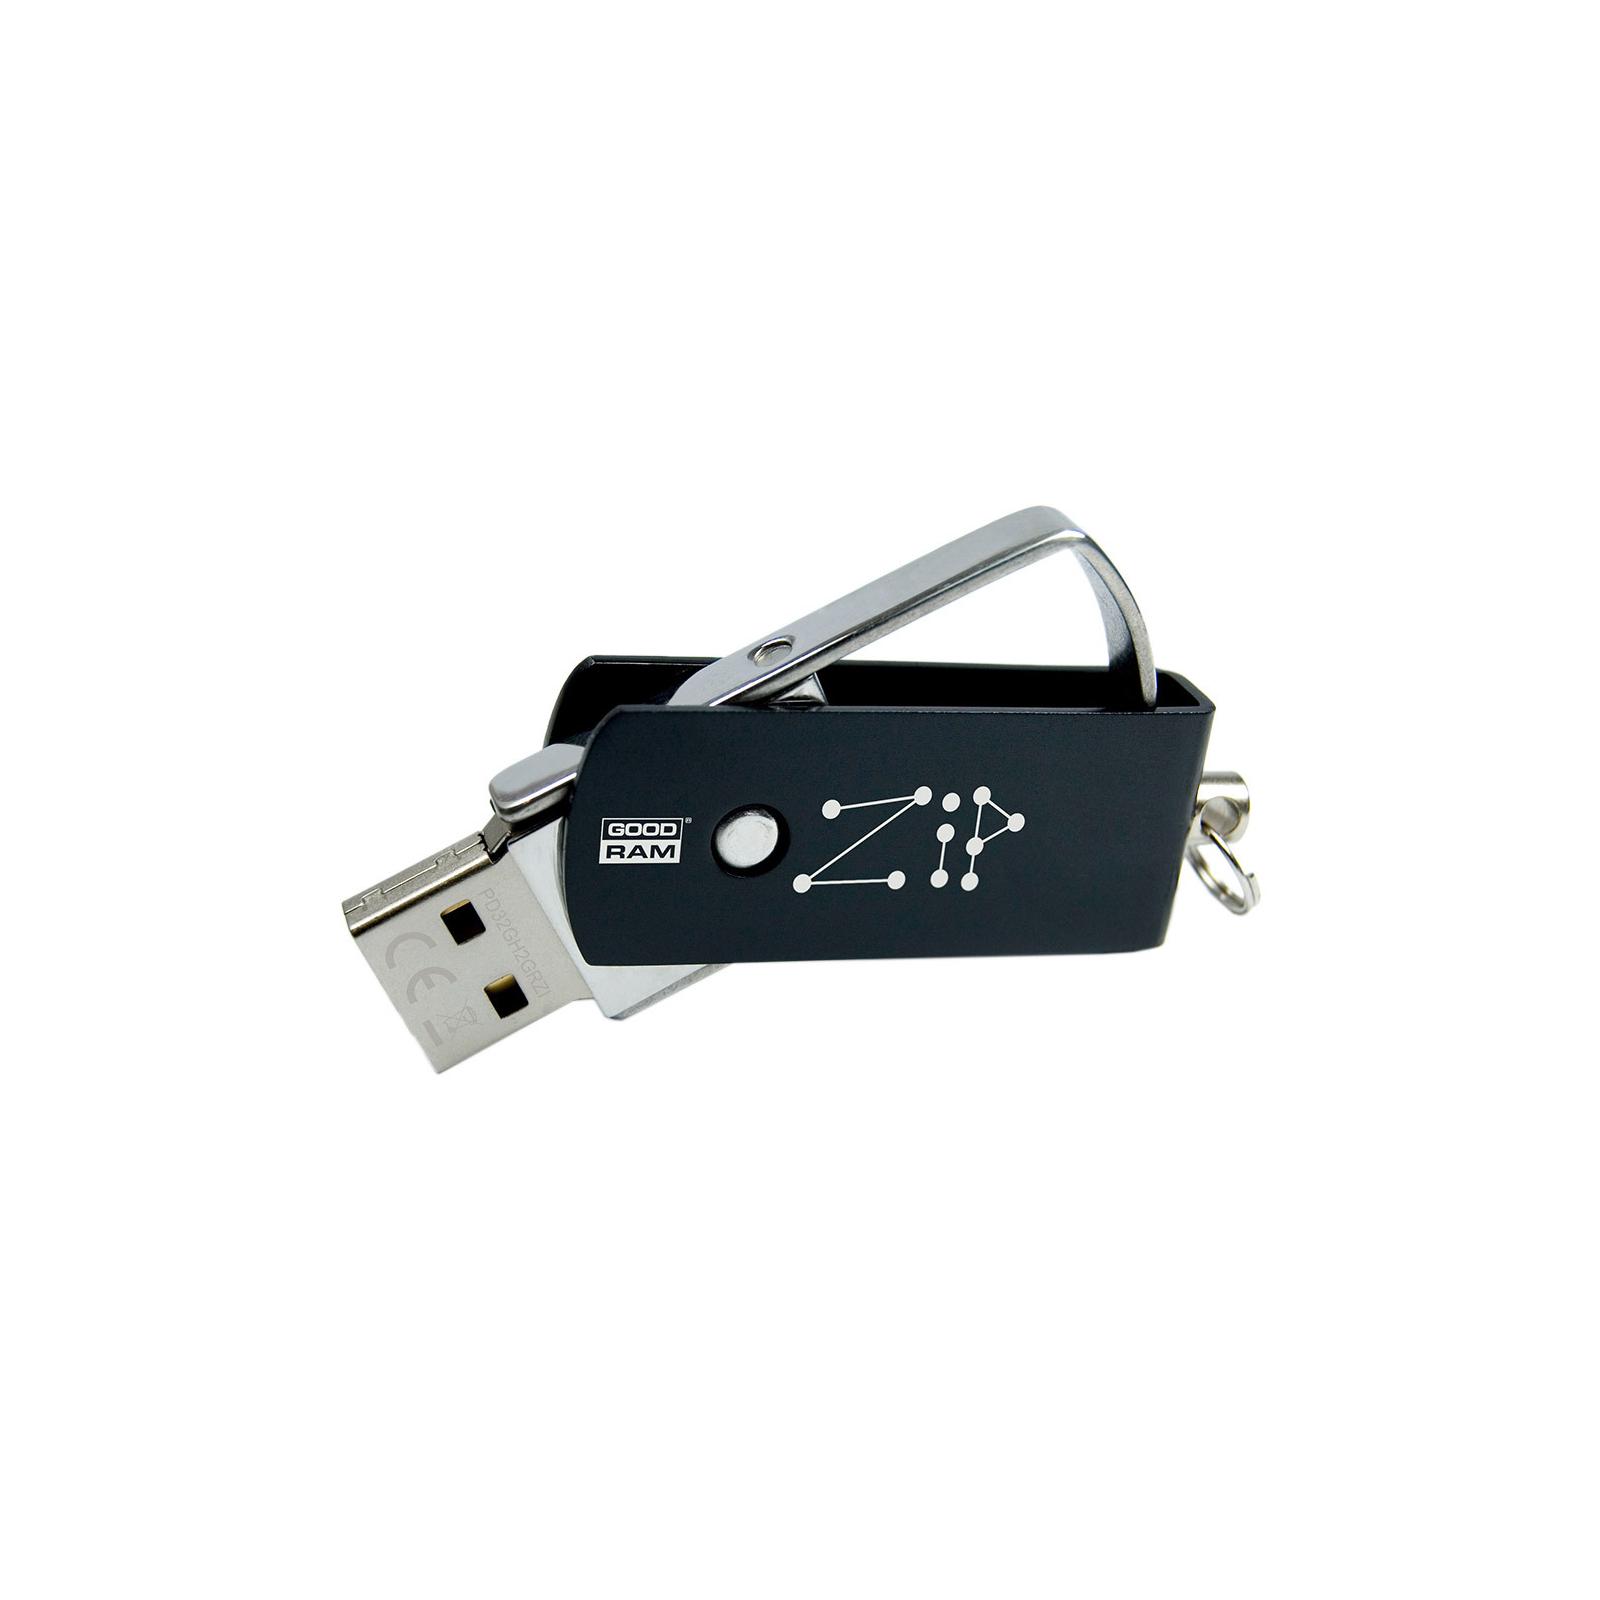 USB флеш накопитель GOODRAM 32GB Zip Black USB 2.0 (PD32GH2GRZIKR9) изображение 3